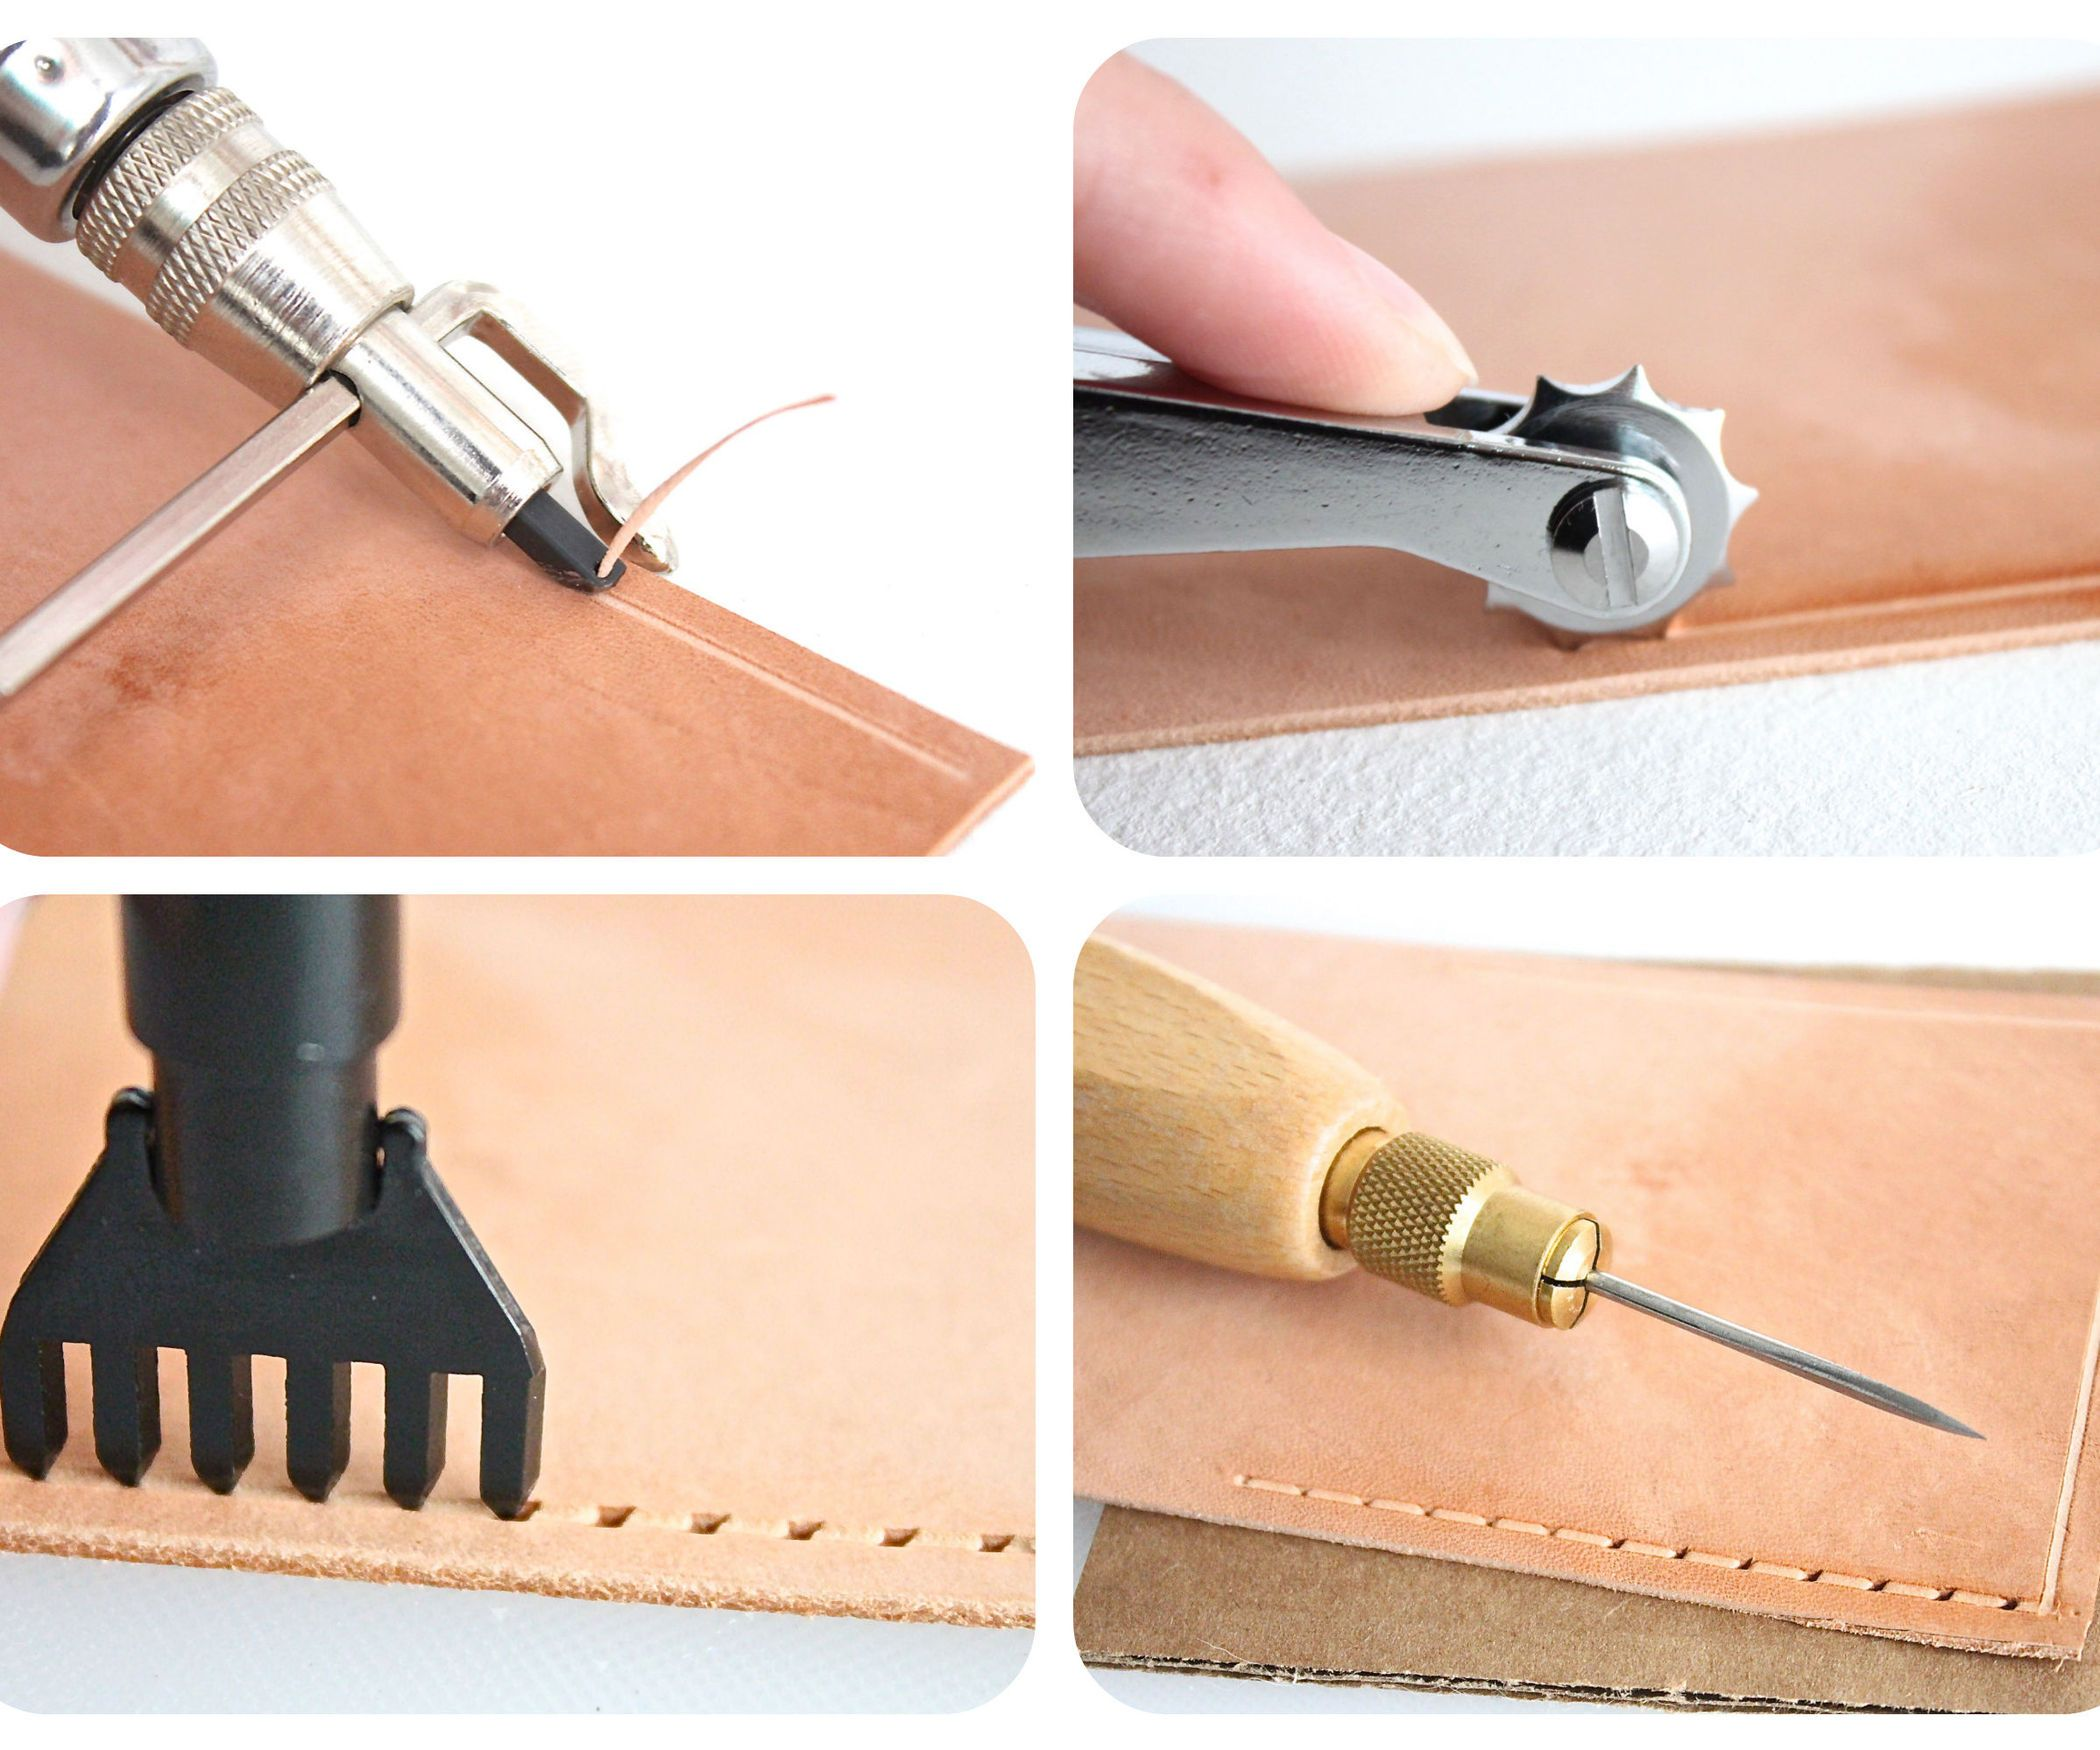 Craftool 10 Piece Diamond Hole Chisel Set Tandy Leather 3009-00 Free Shipping